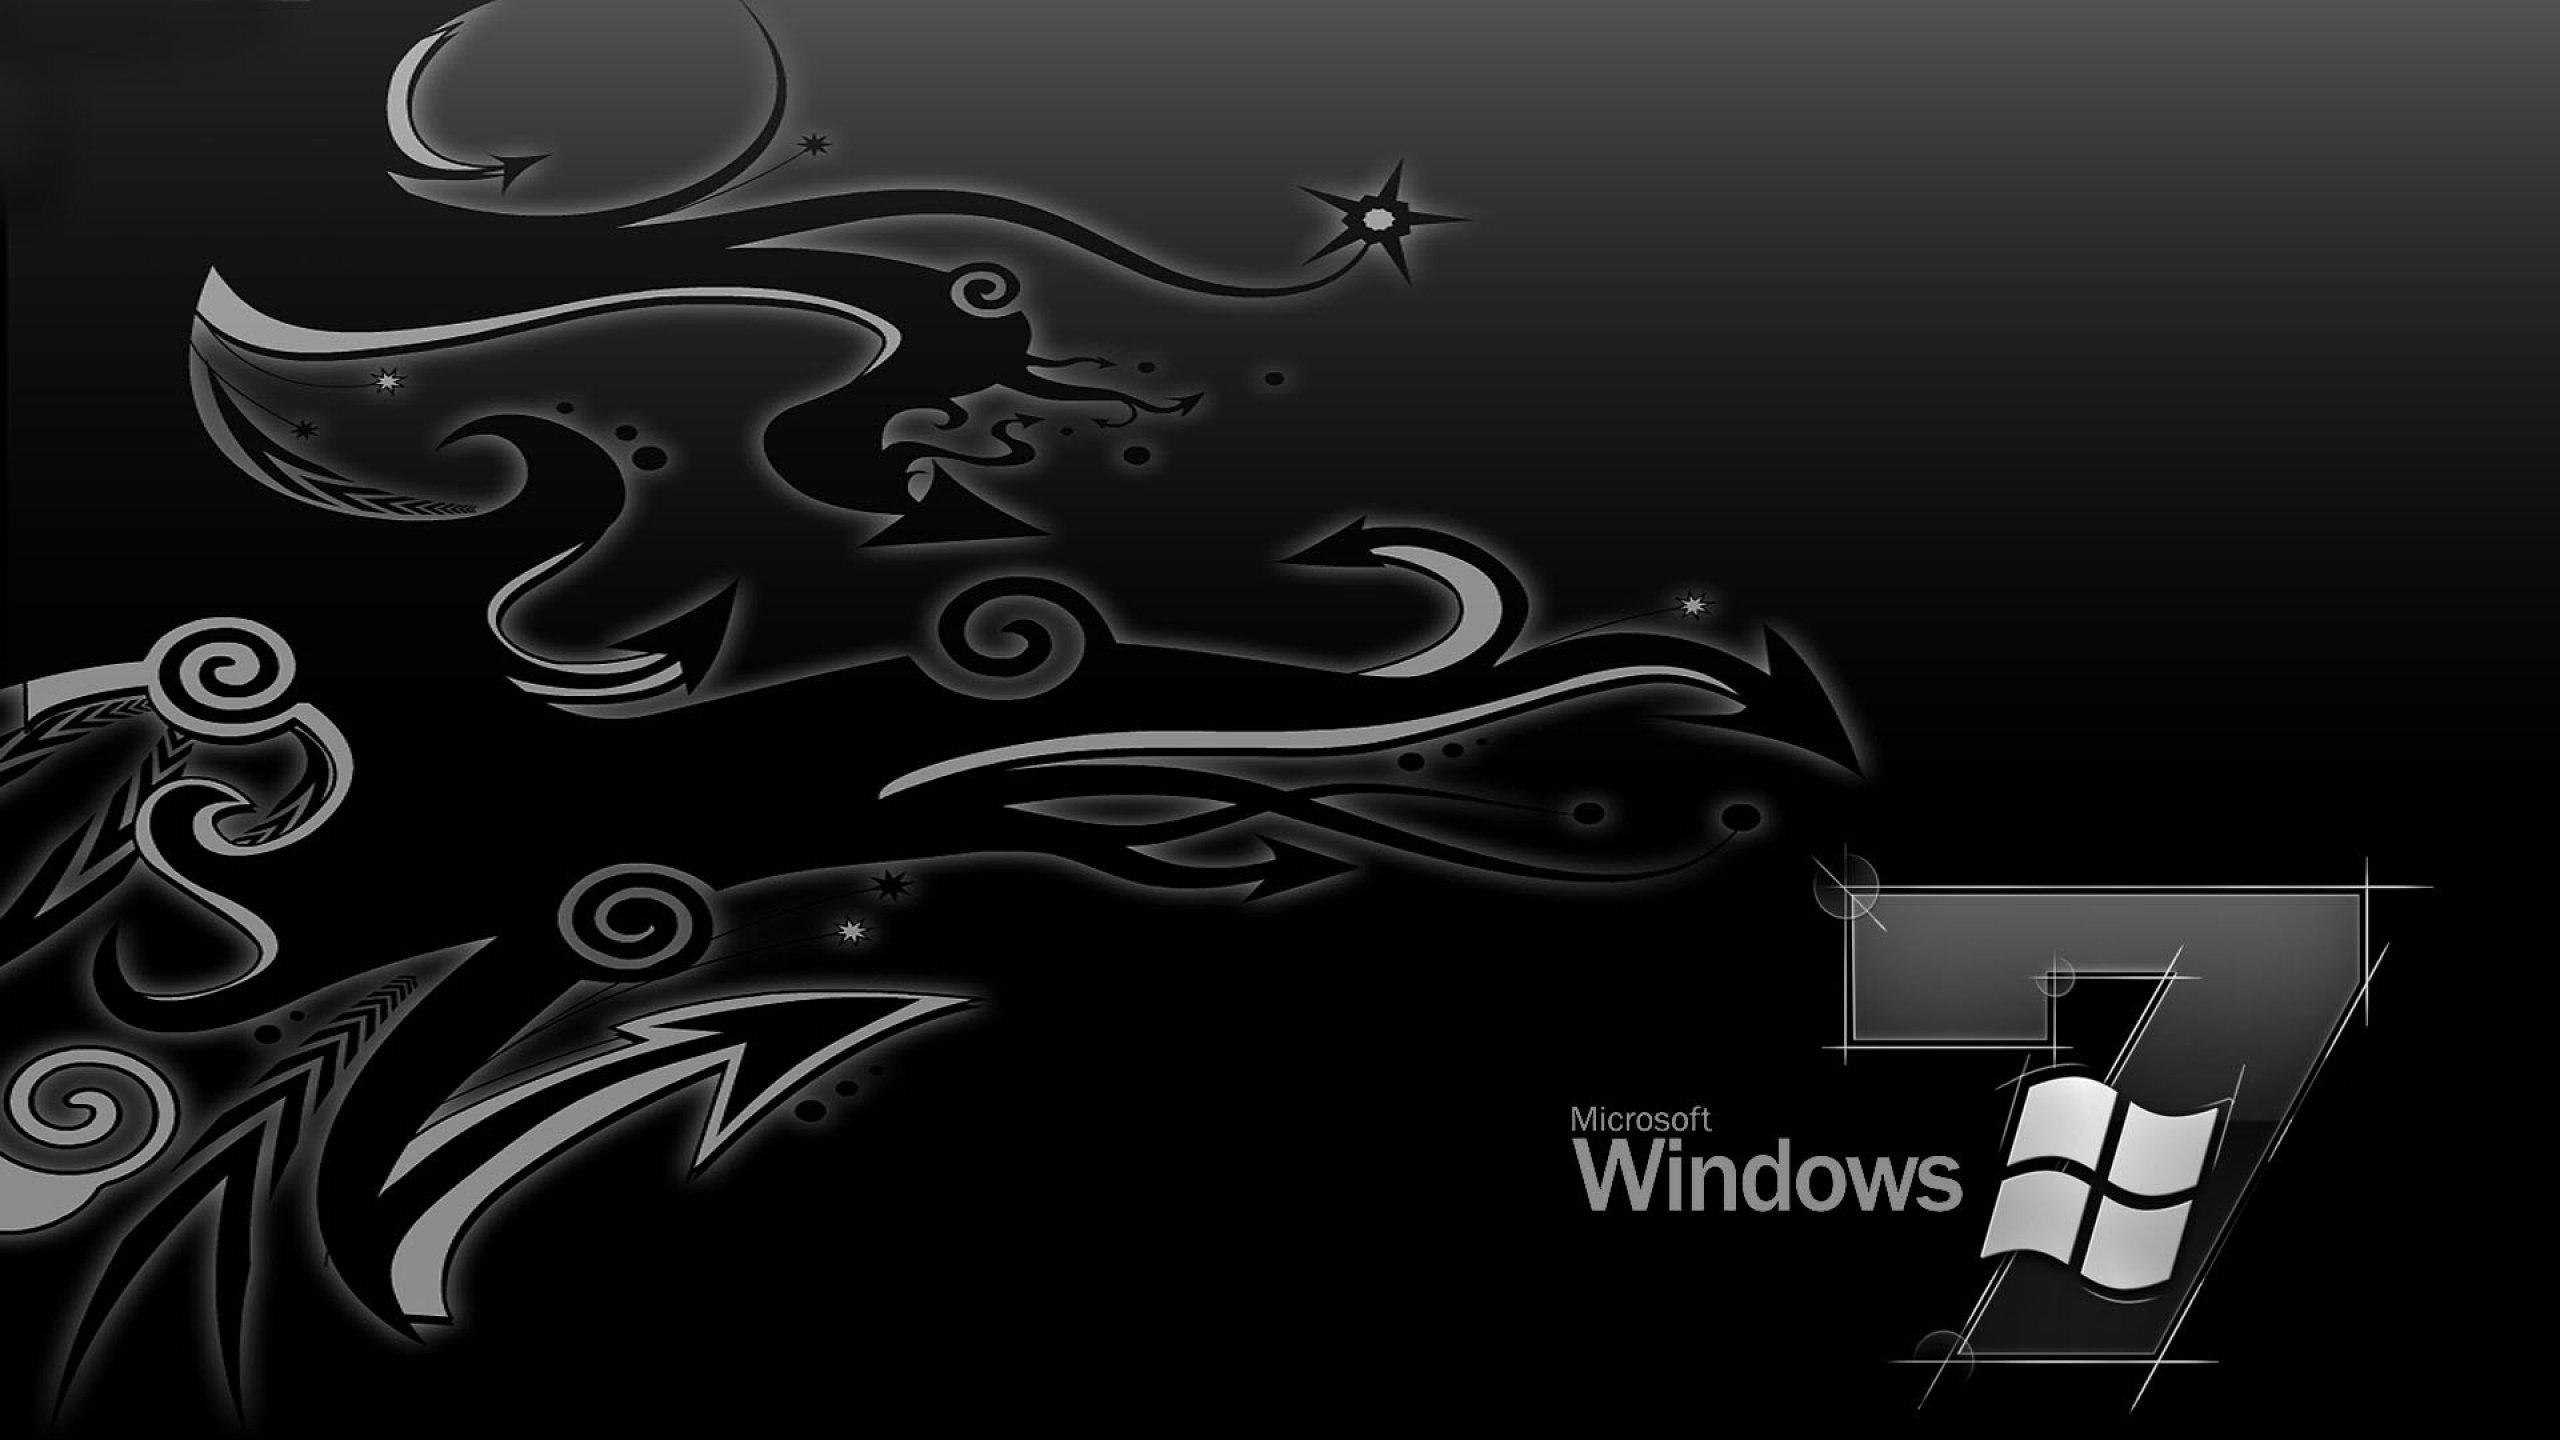 Виндовс 7, OS Windows 7, microsoft, обои hd